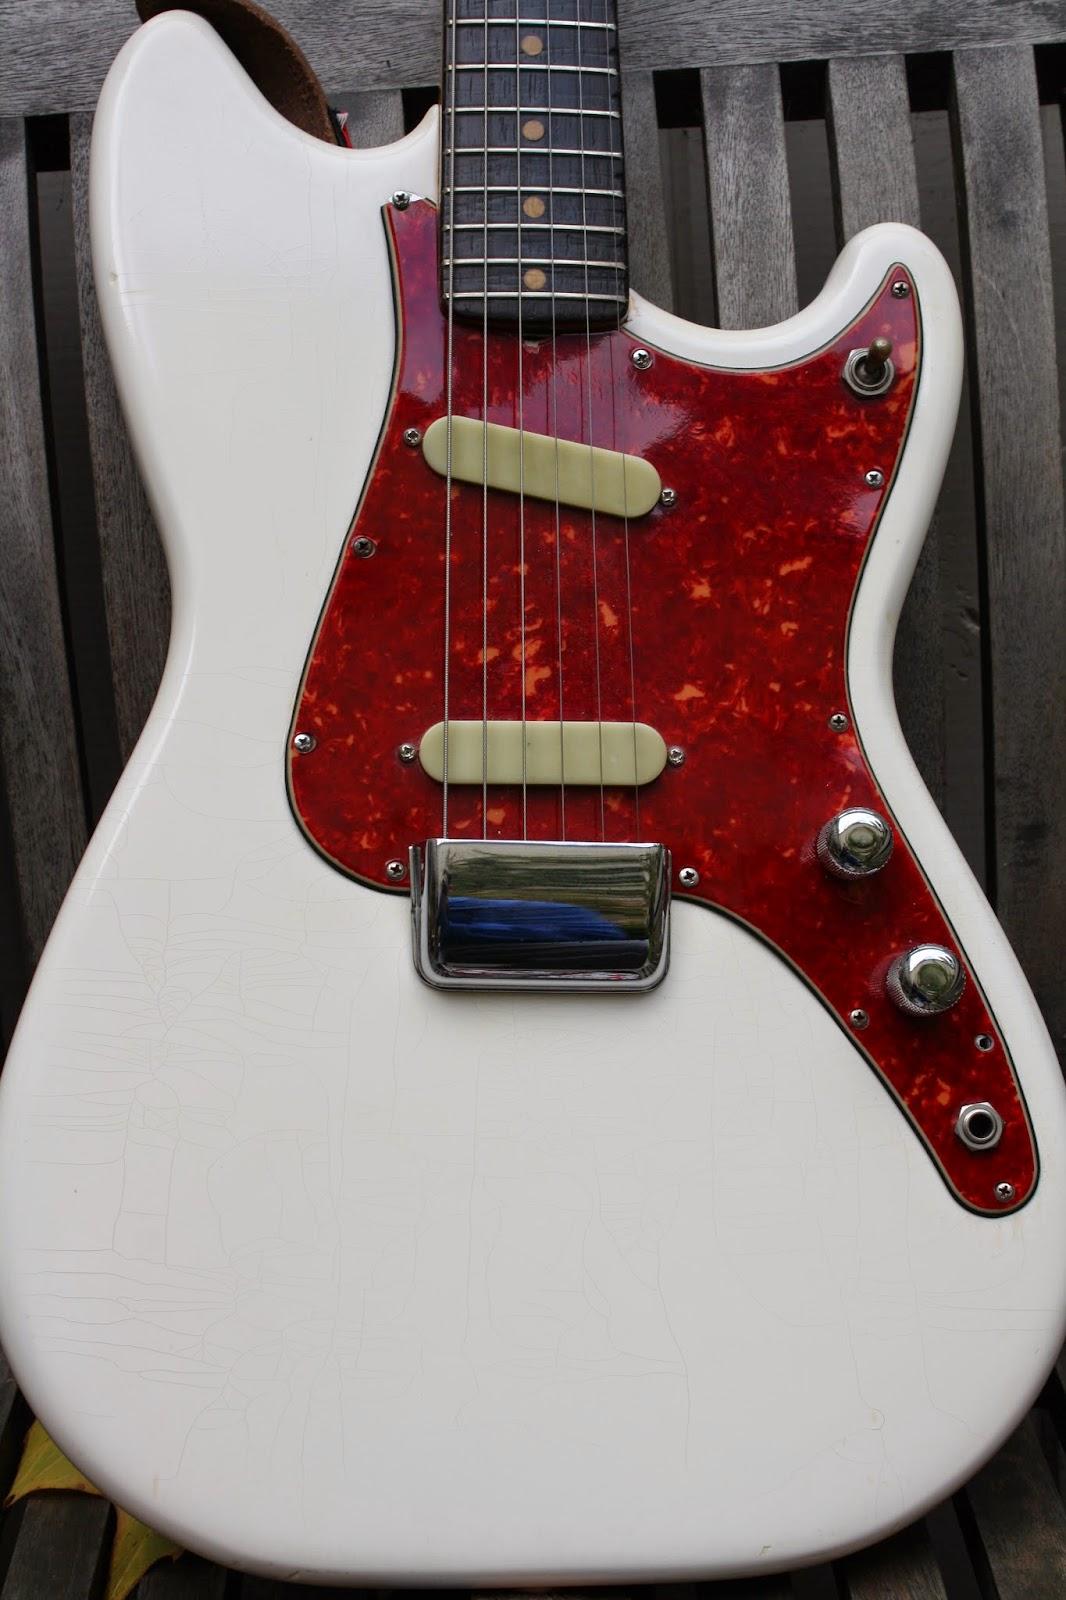 guitare vue de dos